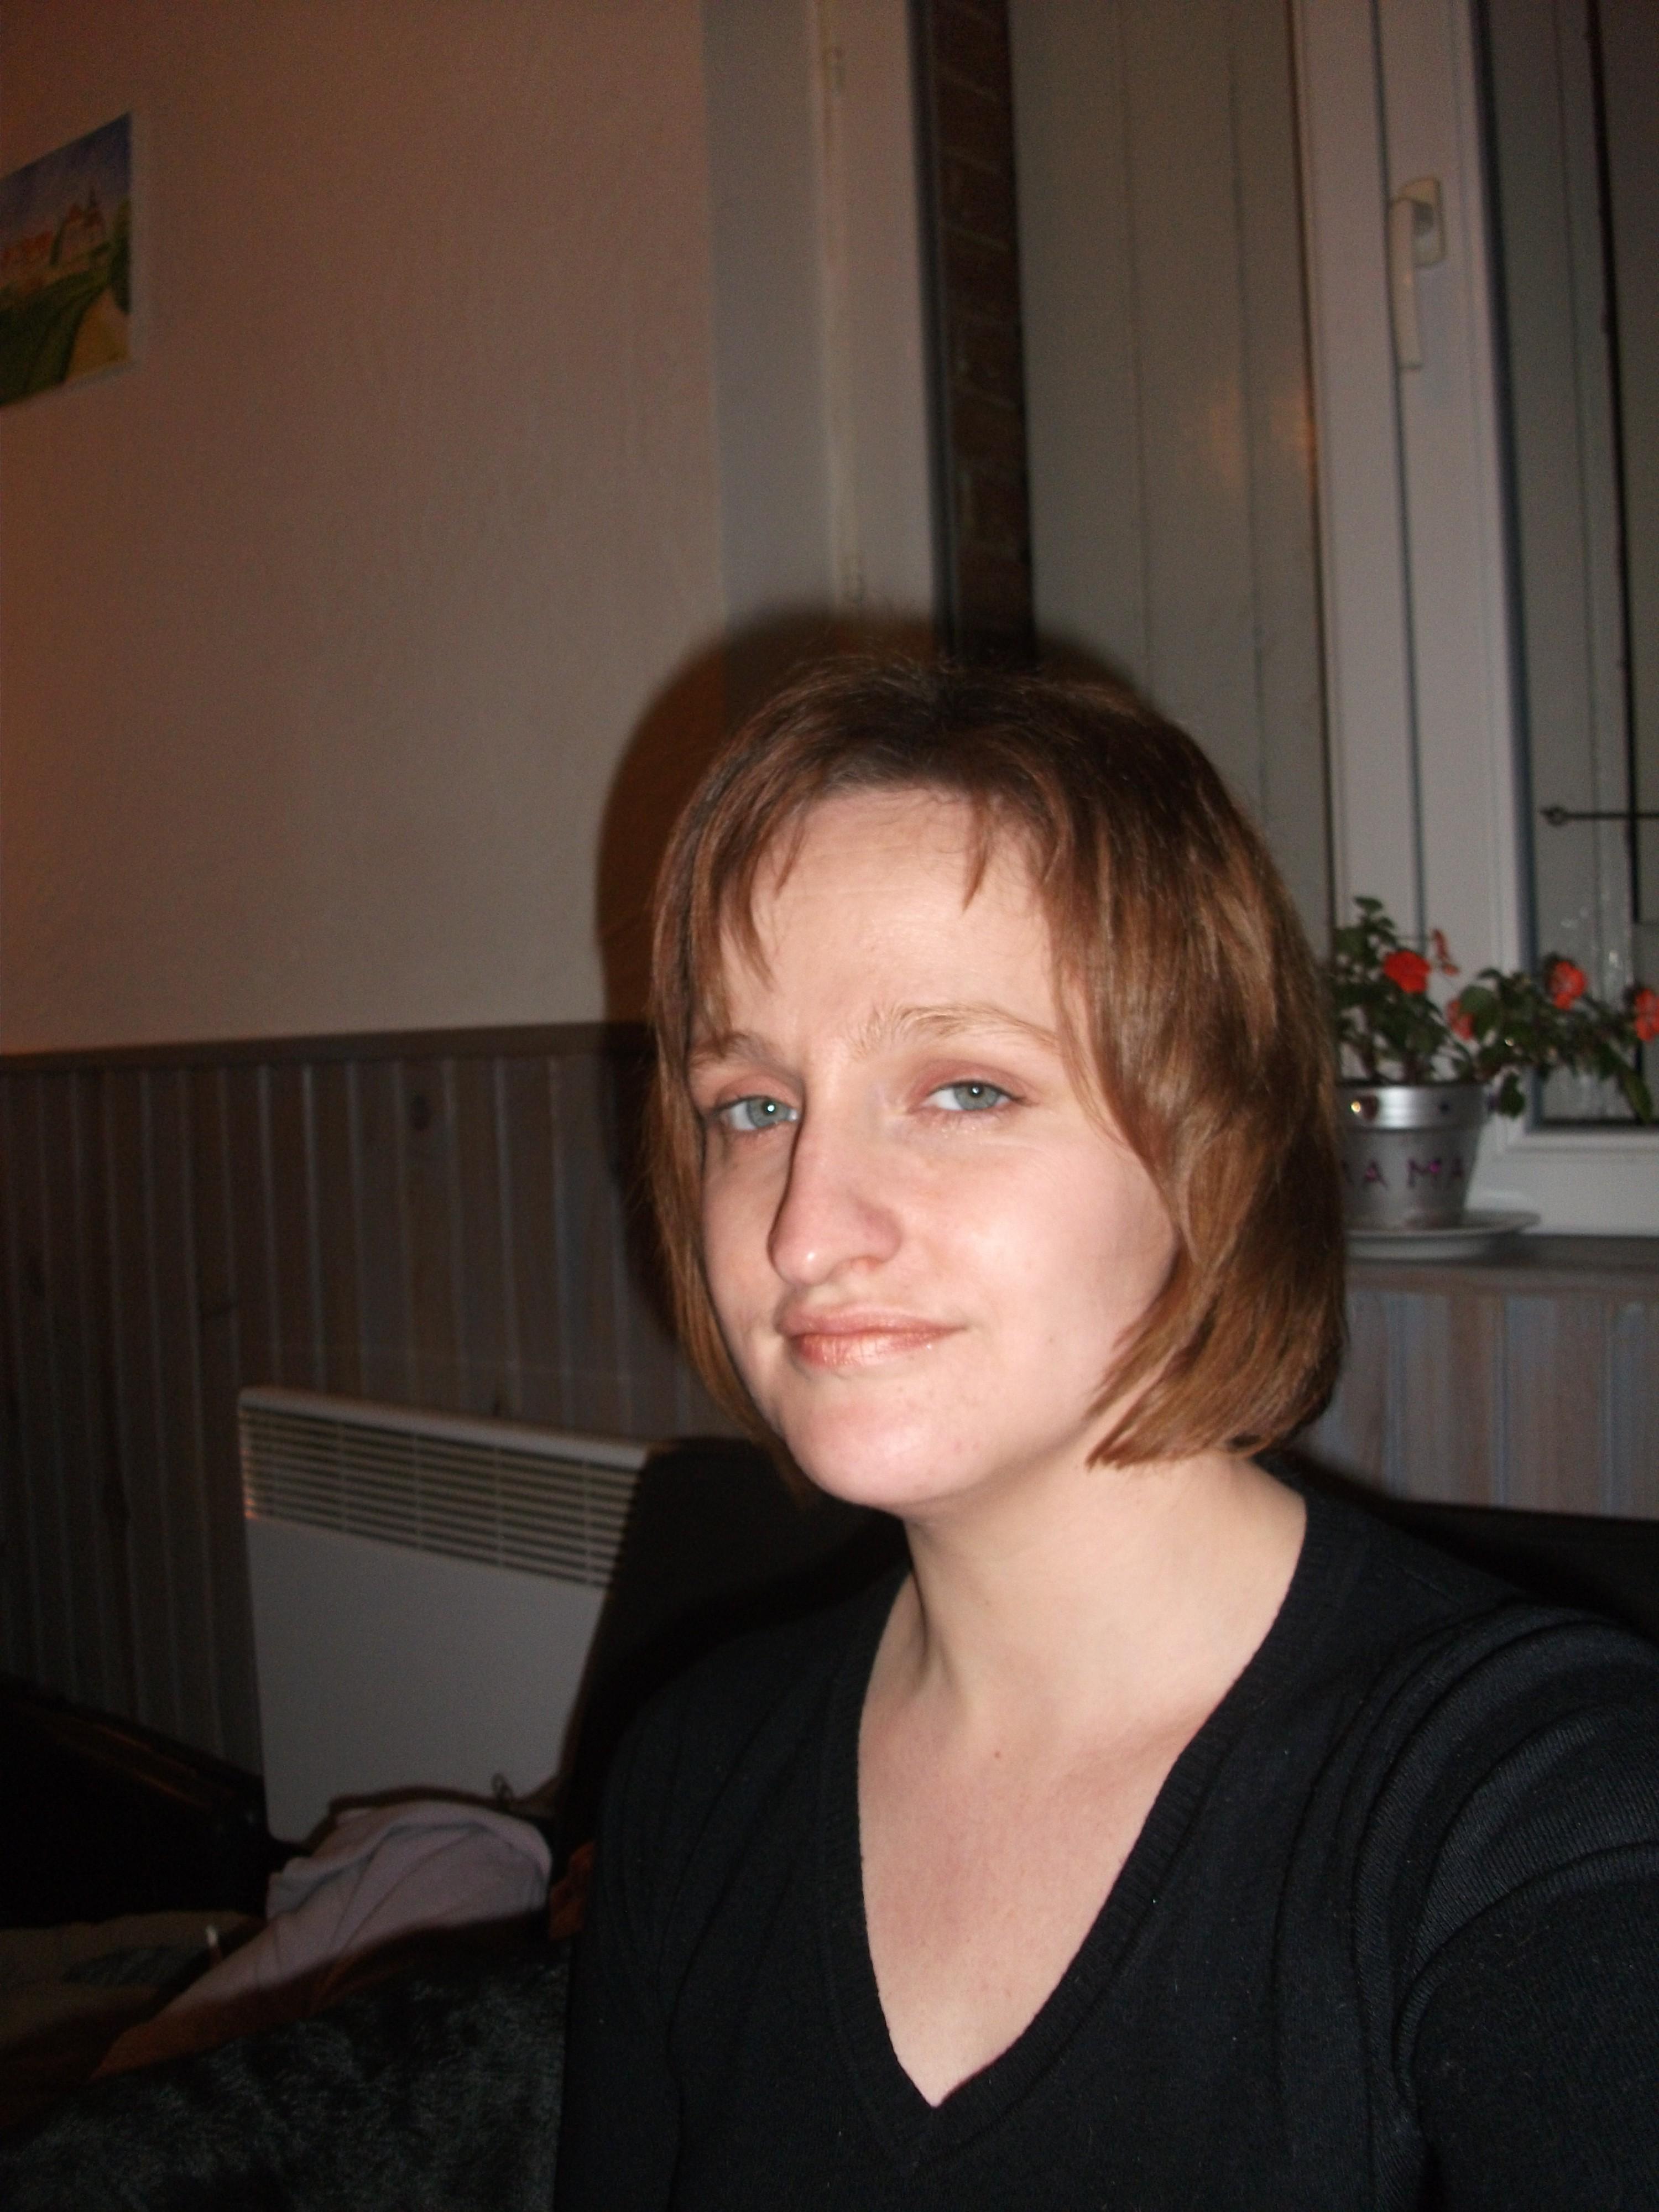 Estelle Collery Hanon